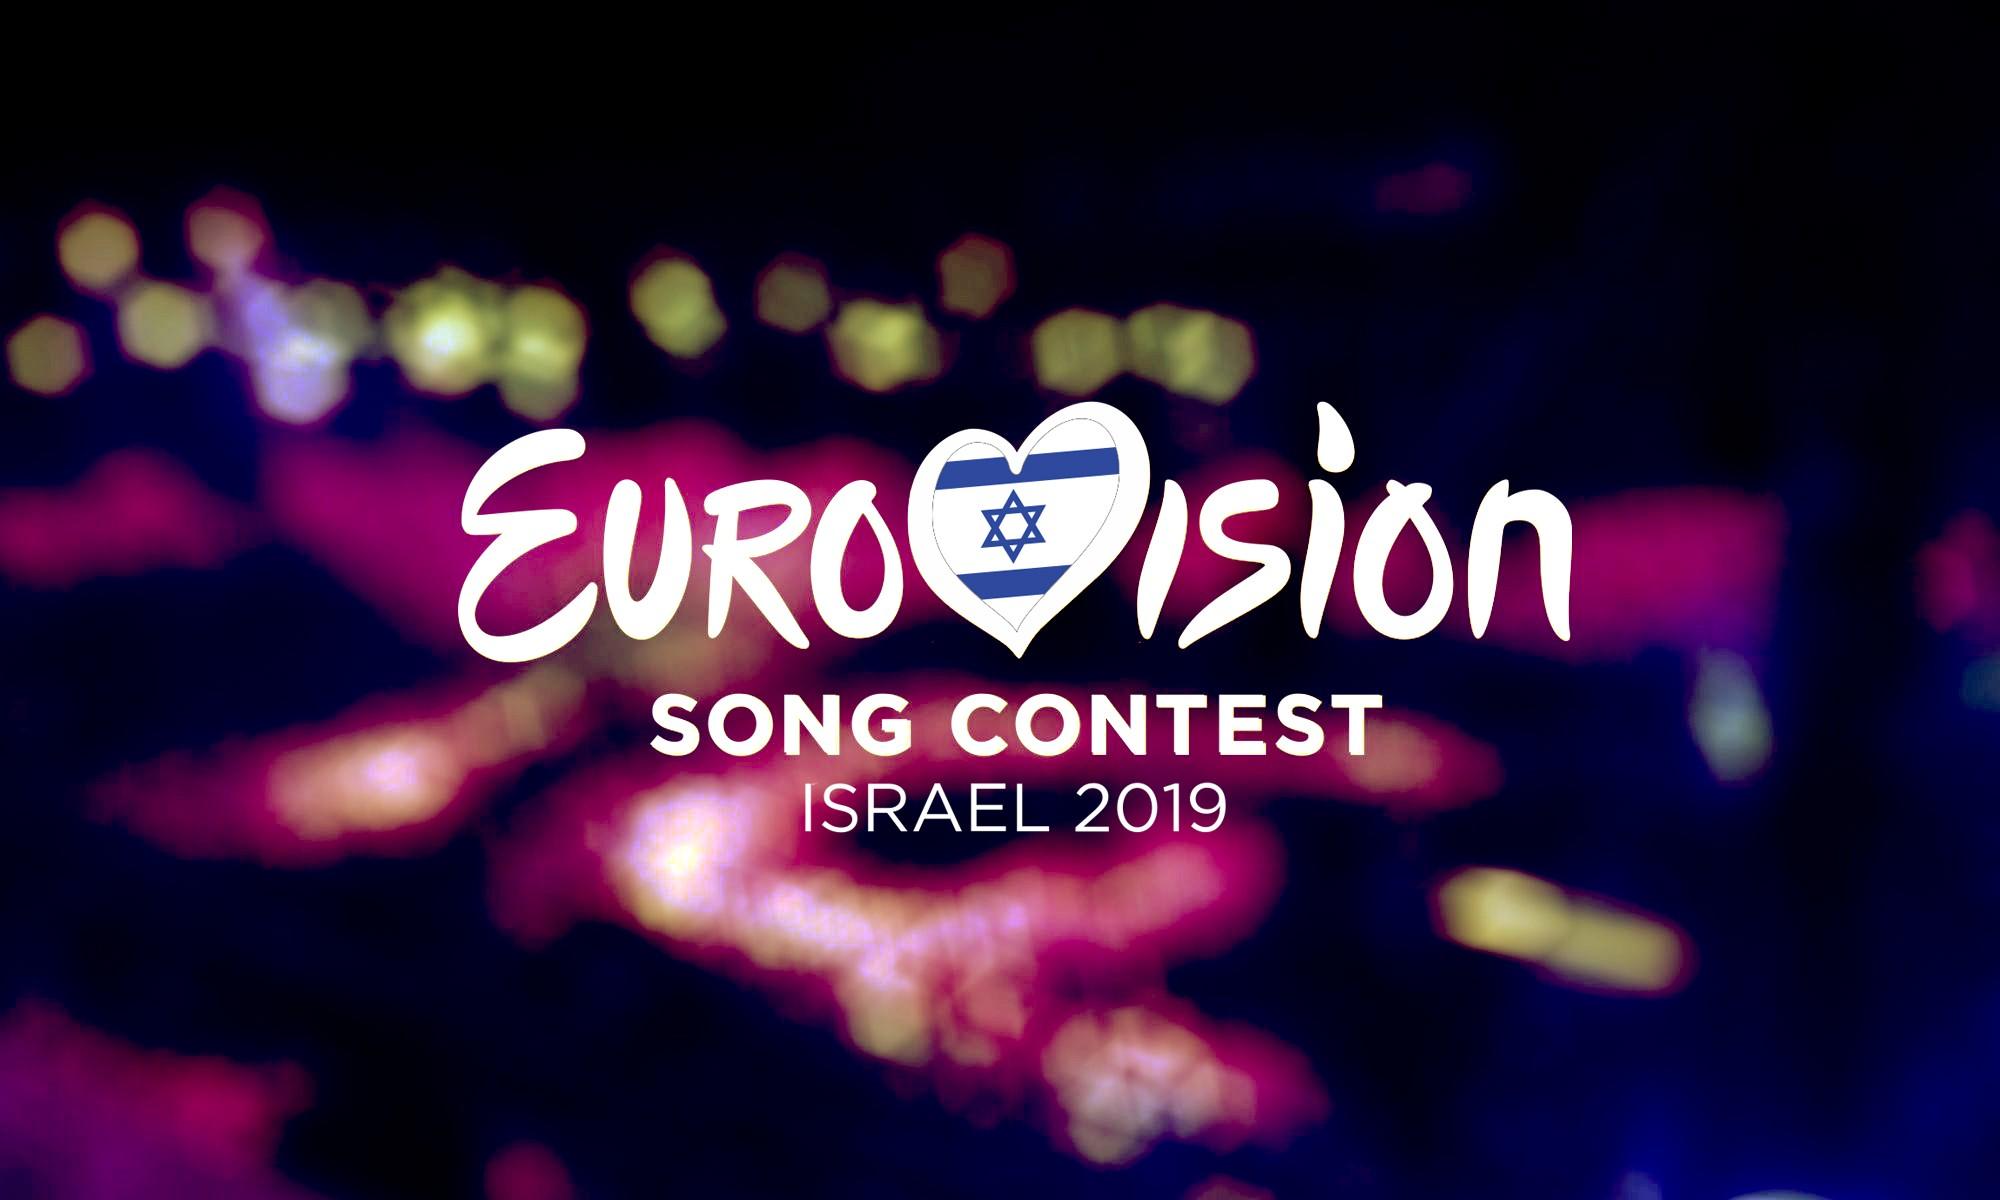 eurovision israel 2019.jpg